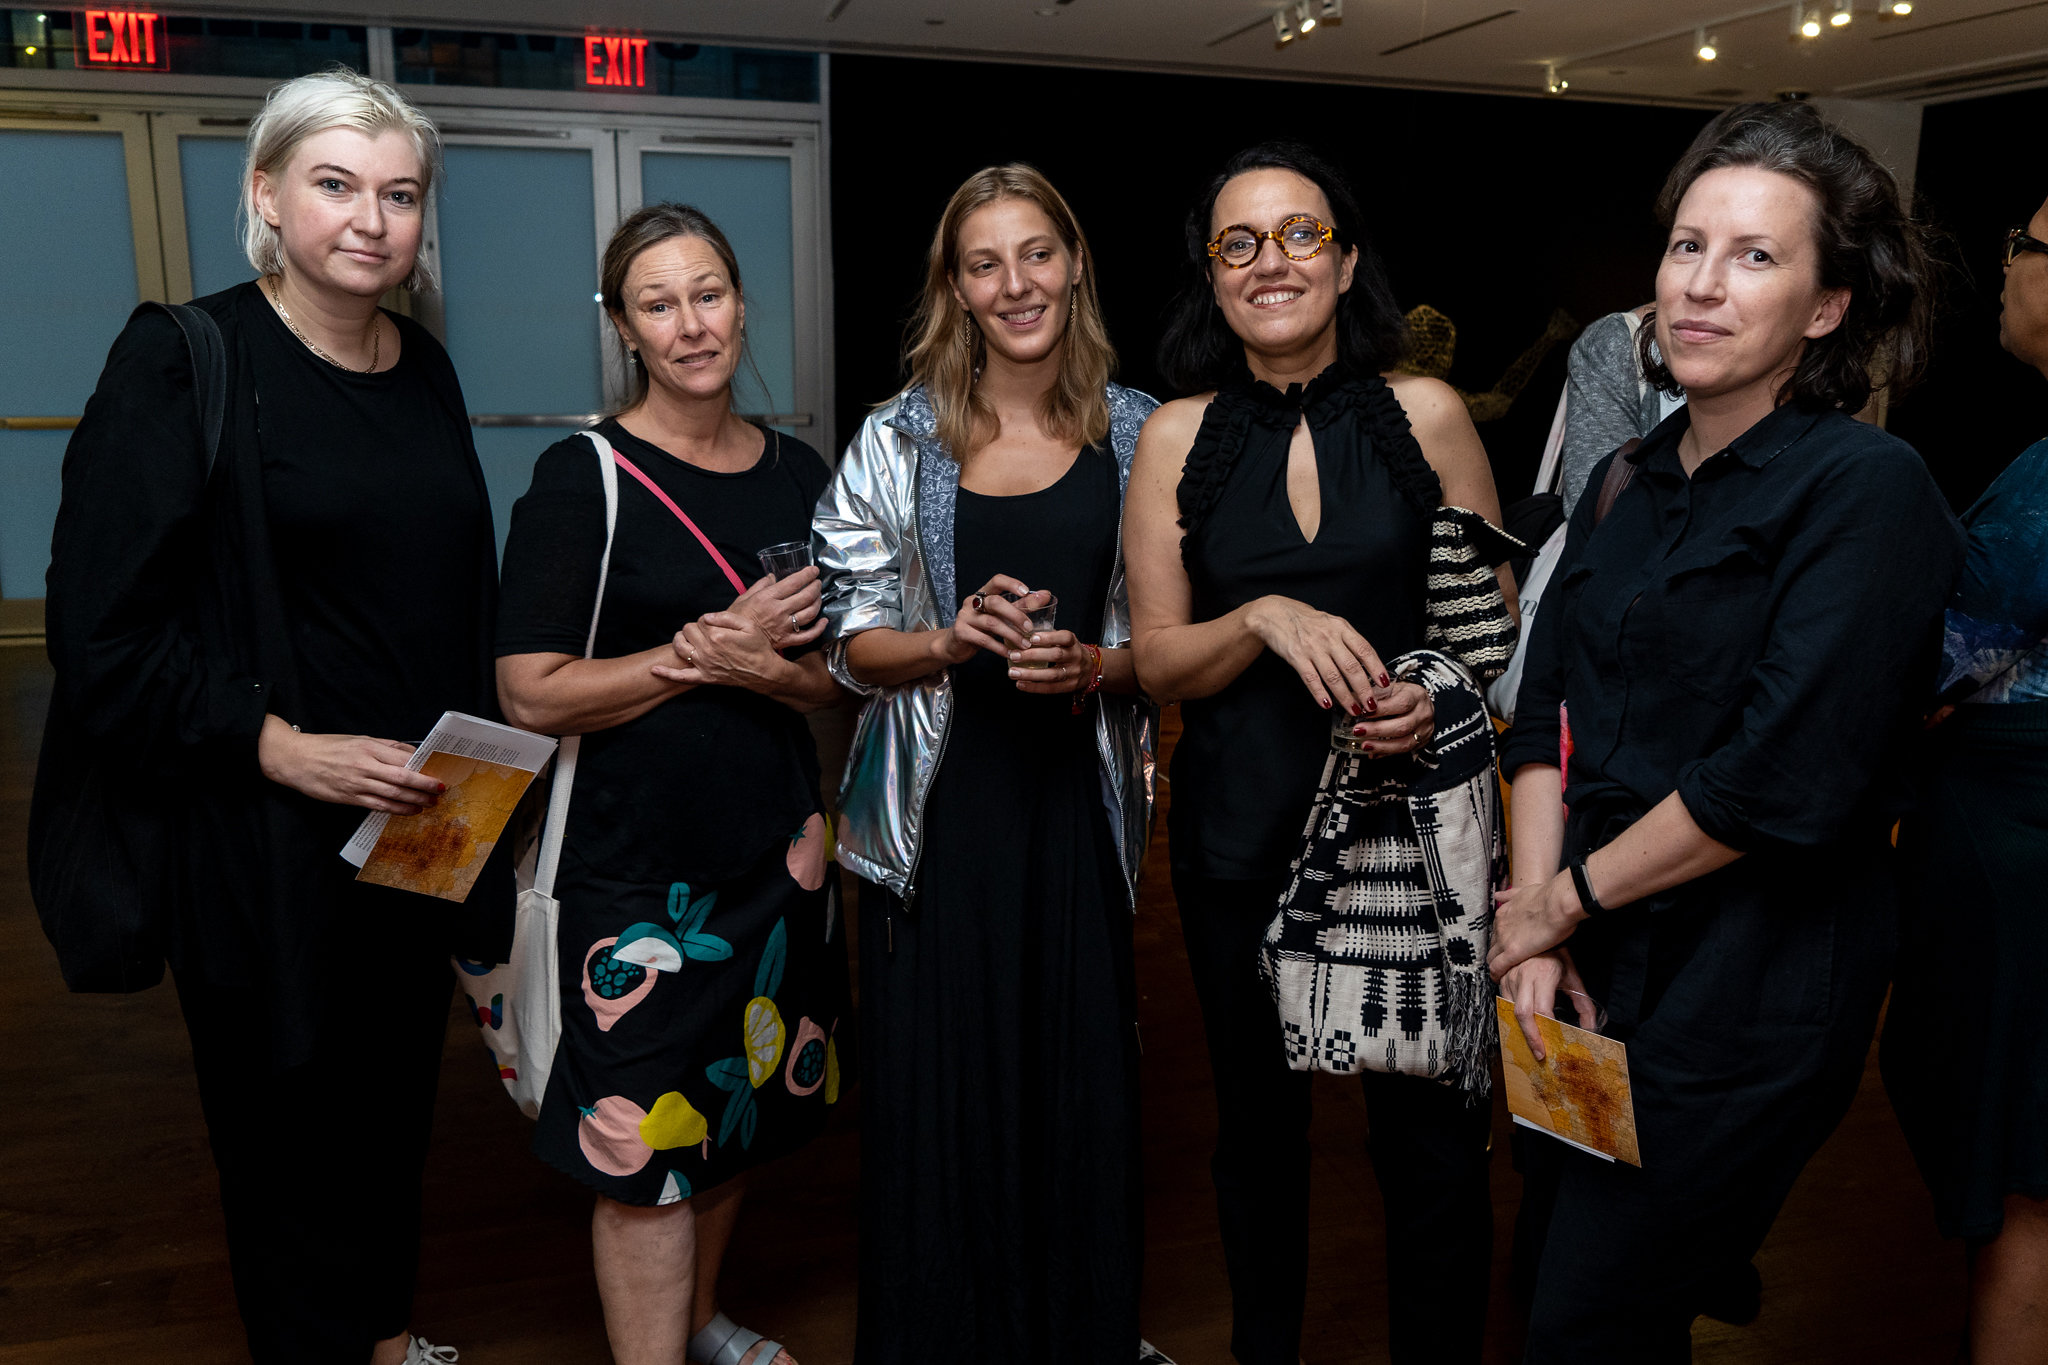 Kasia Gumpert, Jennifer Karady, Ida Bochenska, Monika Fabijanska, Agata Endo Nowicka. The Un-Heroic-Act opening. Photo Austin Pogrob